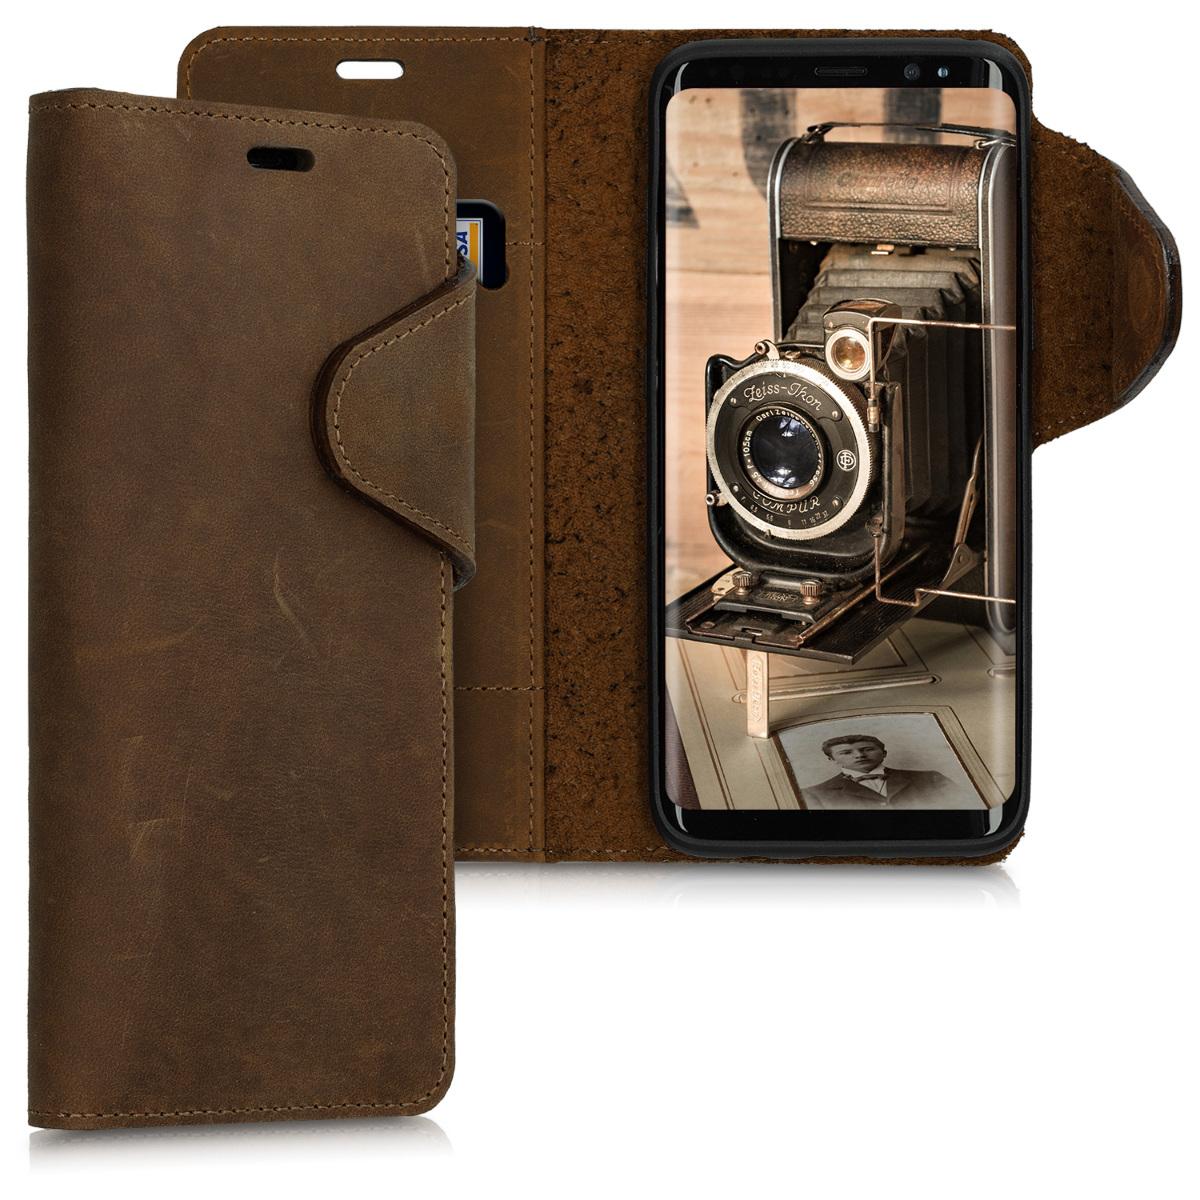 Kalibri Δερμάτινη Θήκη - πορτοφόλι Samsung Galaxy S8 - Brown (46744.05)